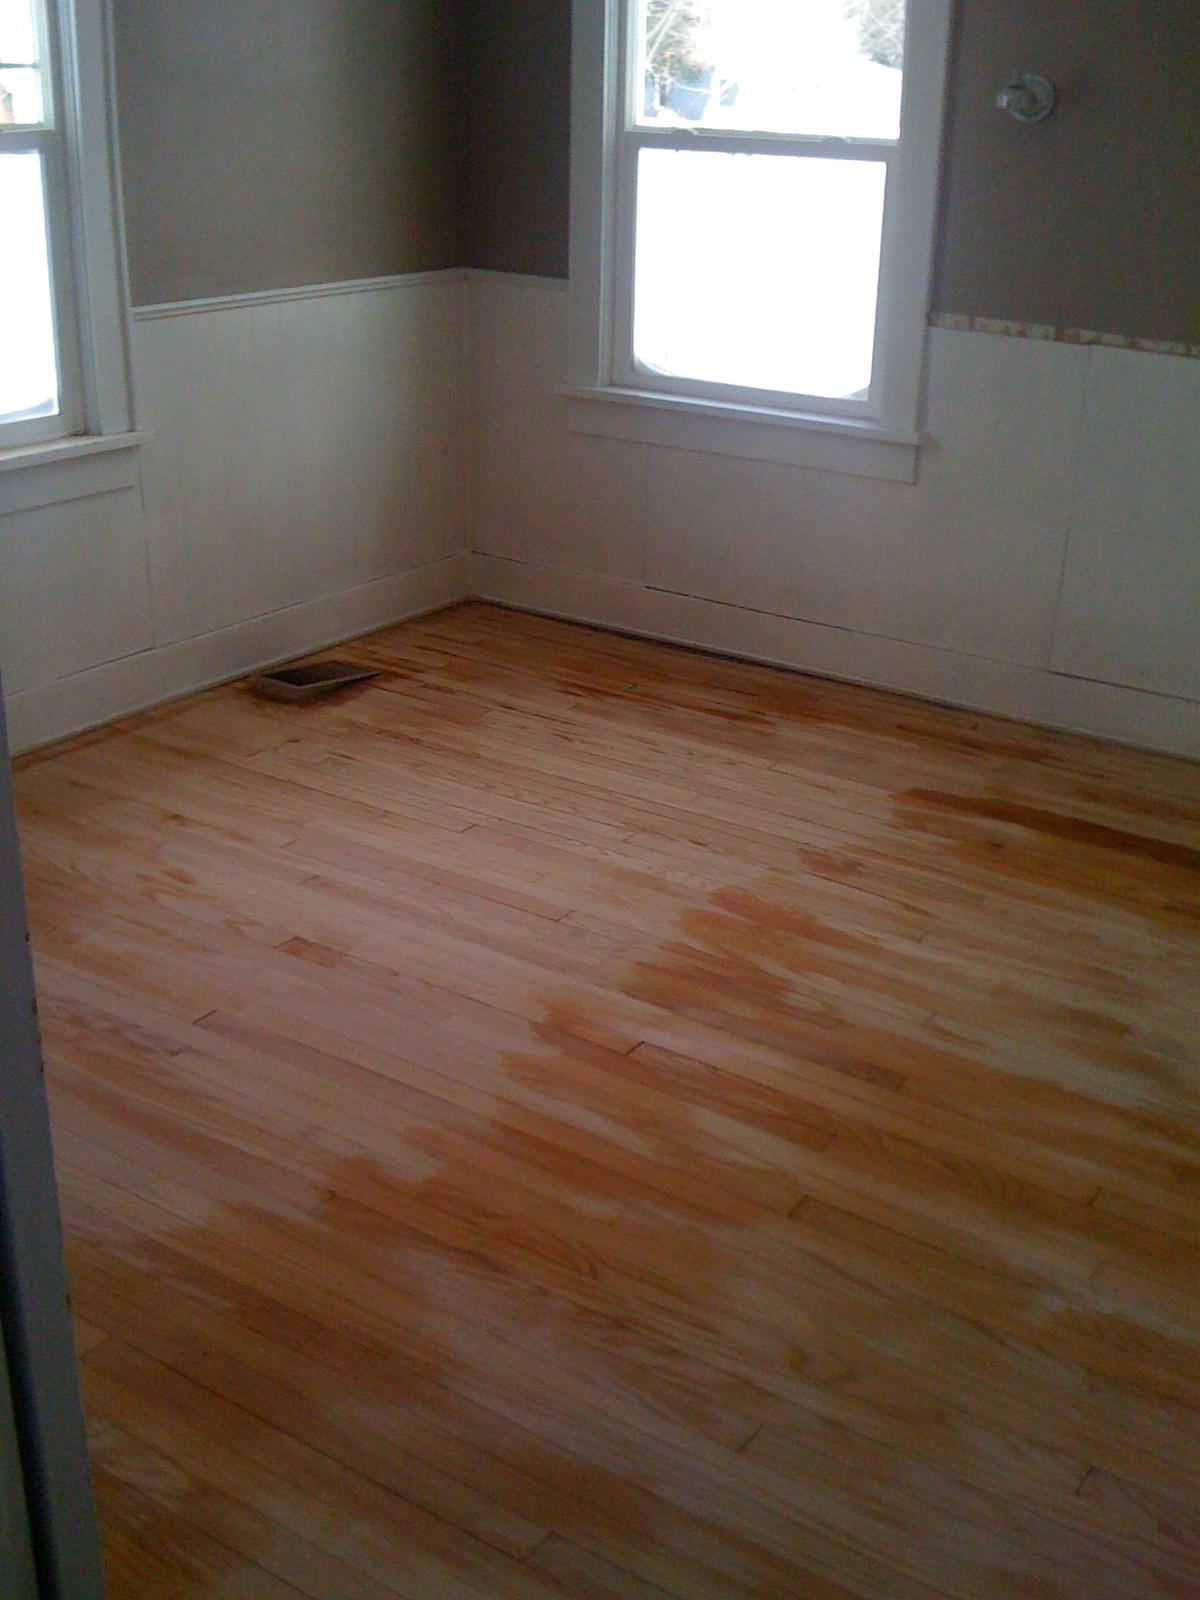 Bathroom Remodel Yukon Ok : How hard could it be